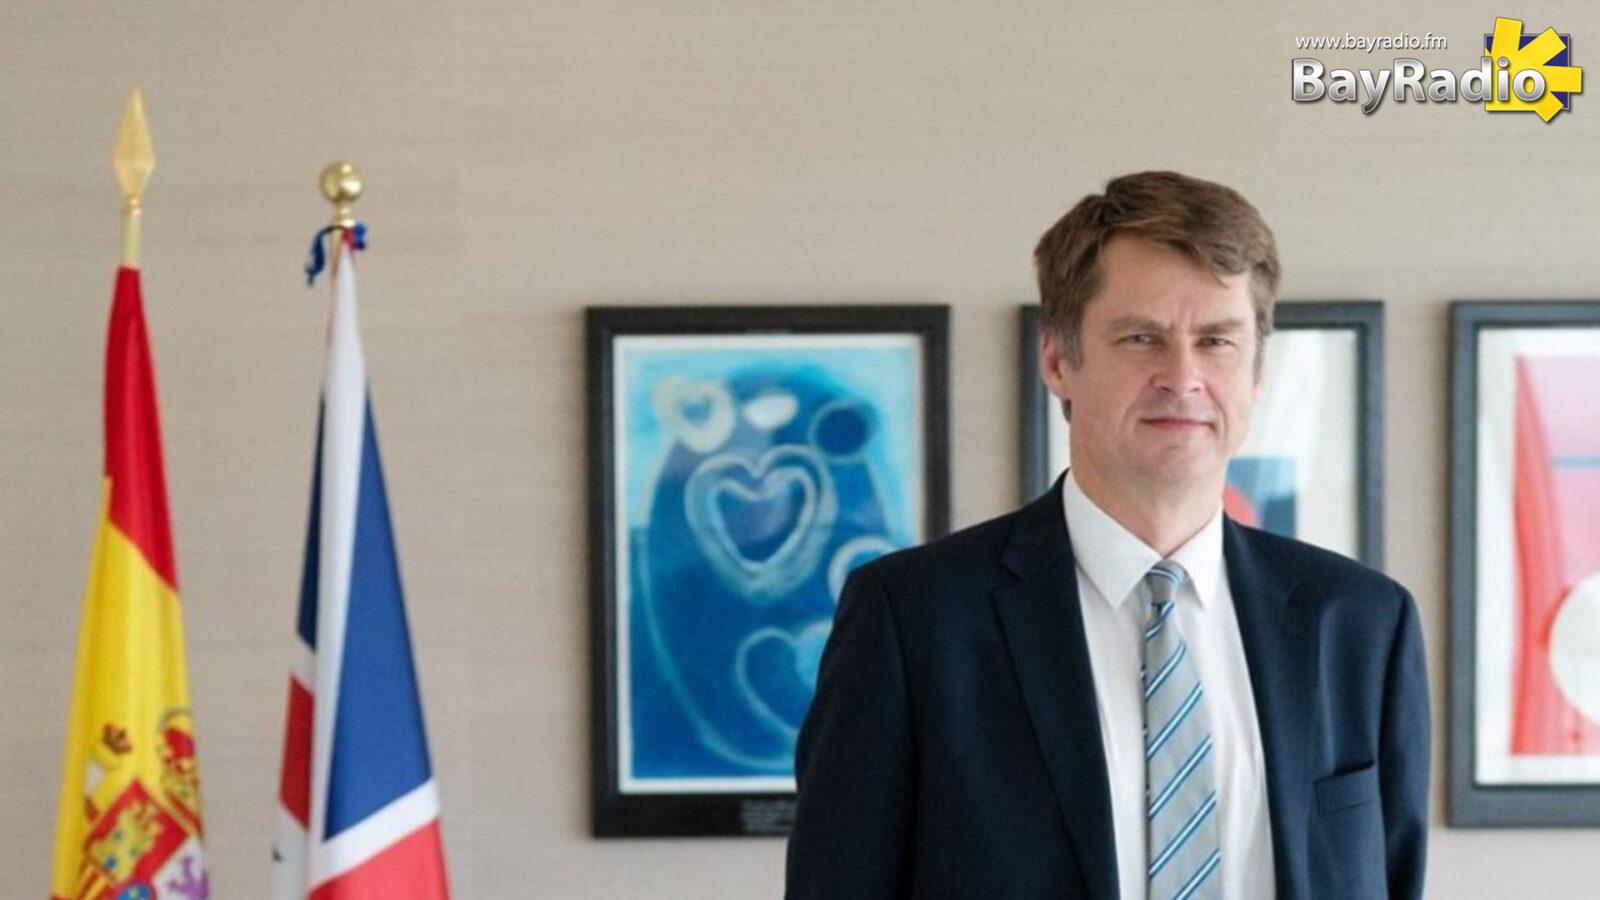 HMA Hugh Elliott Speaking to BayRadio on Covid-19 Coronavirus and Advice for British Expats 18-03-20